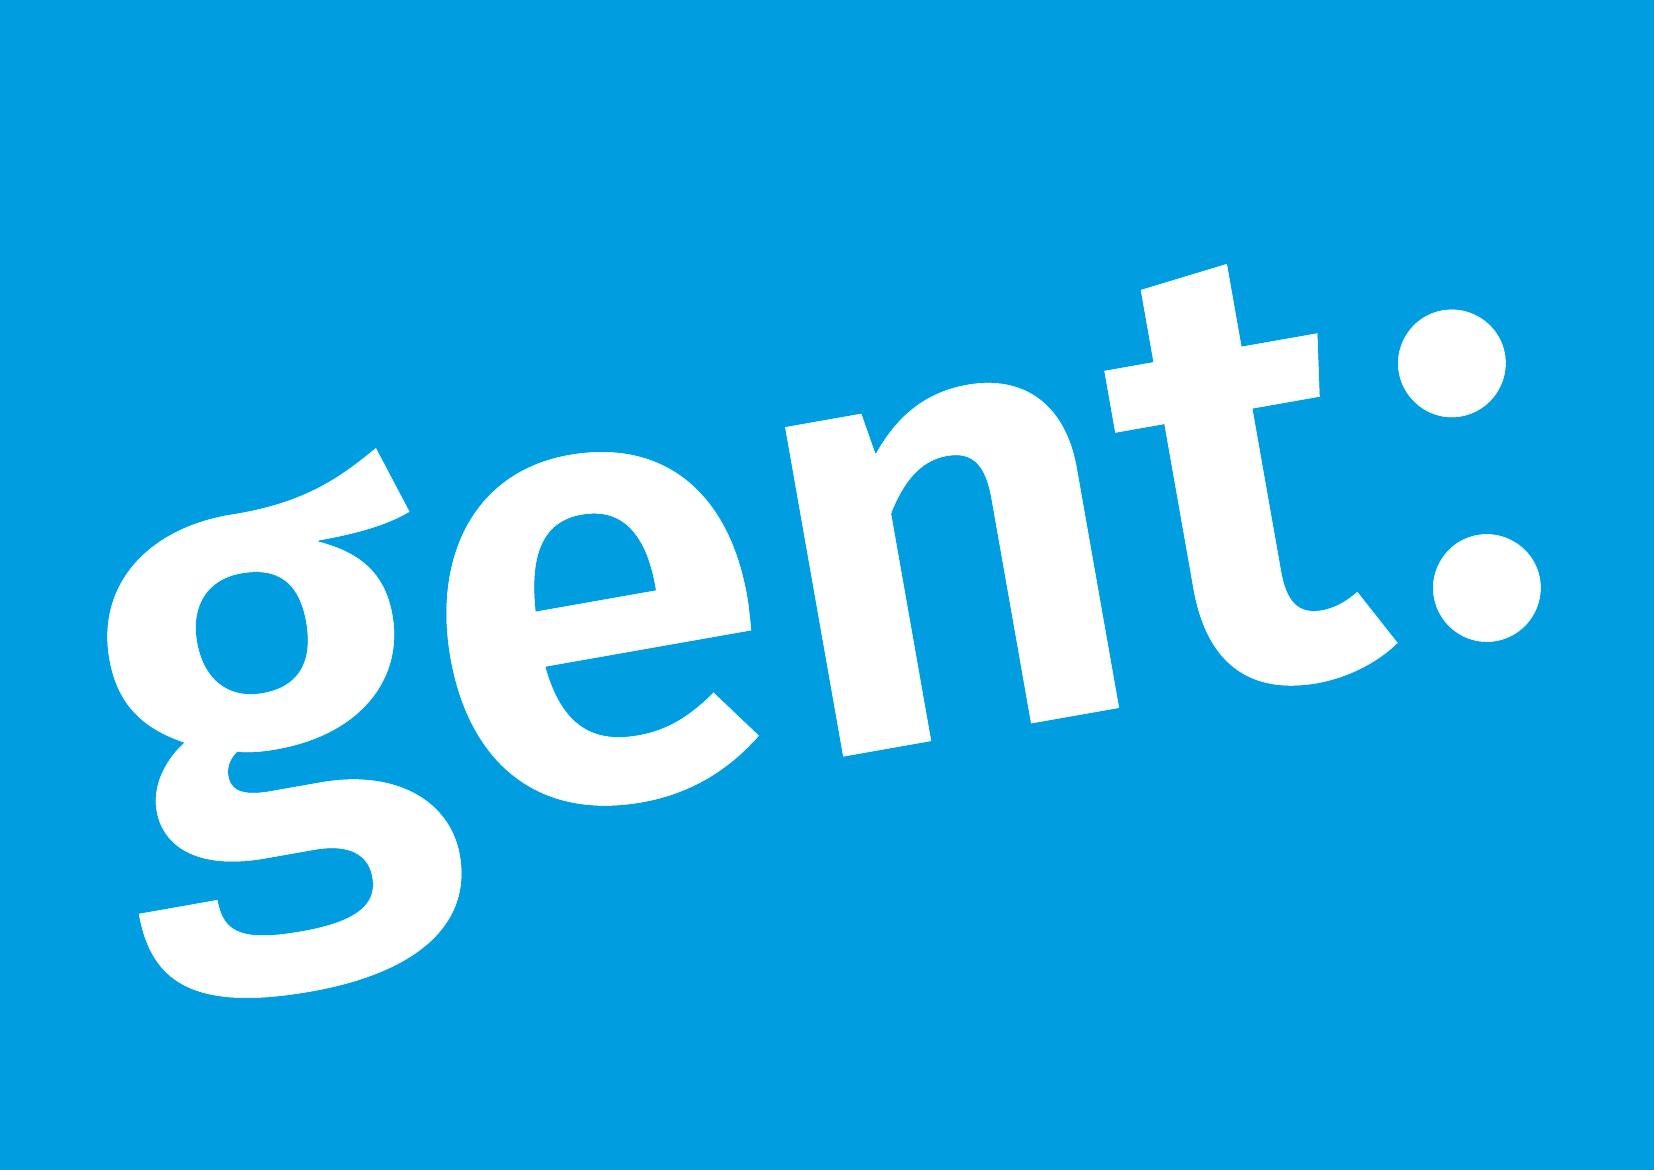 Stad Gent logo